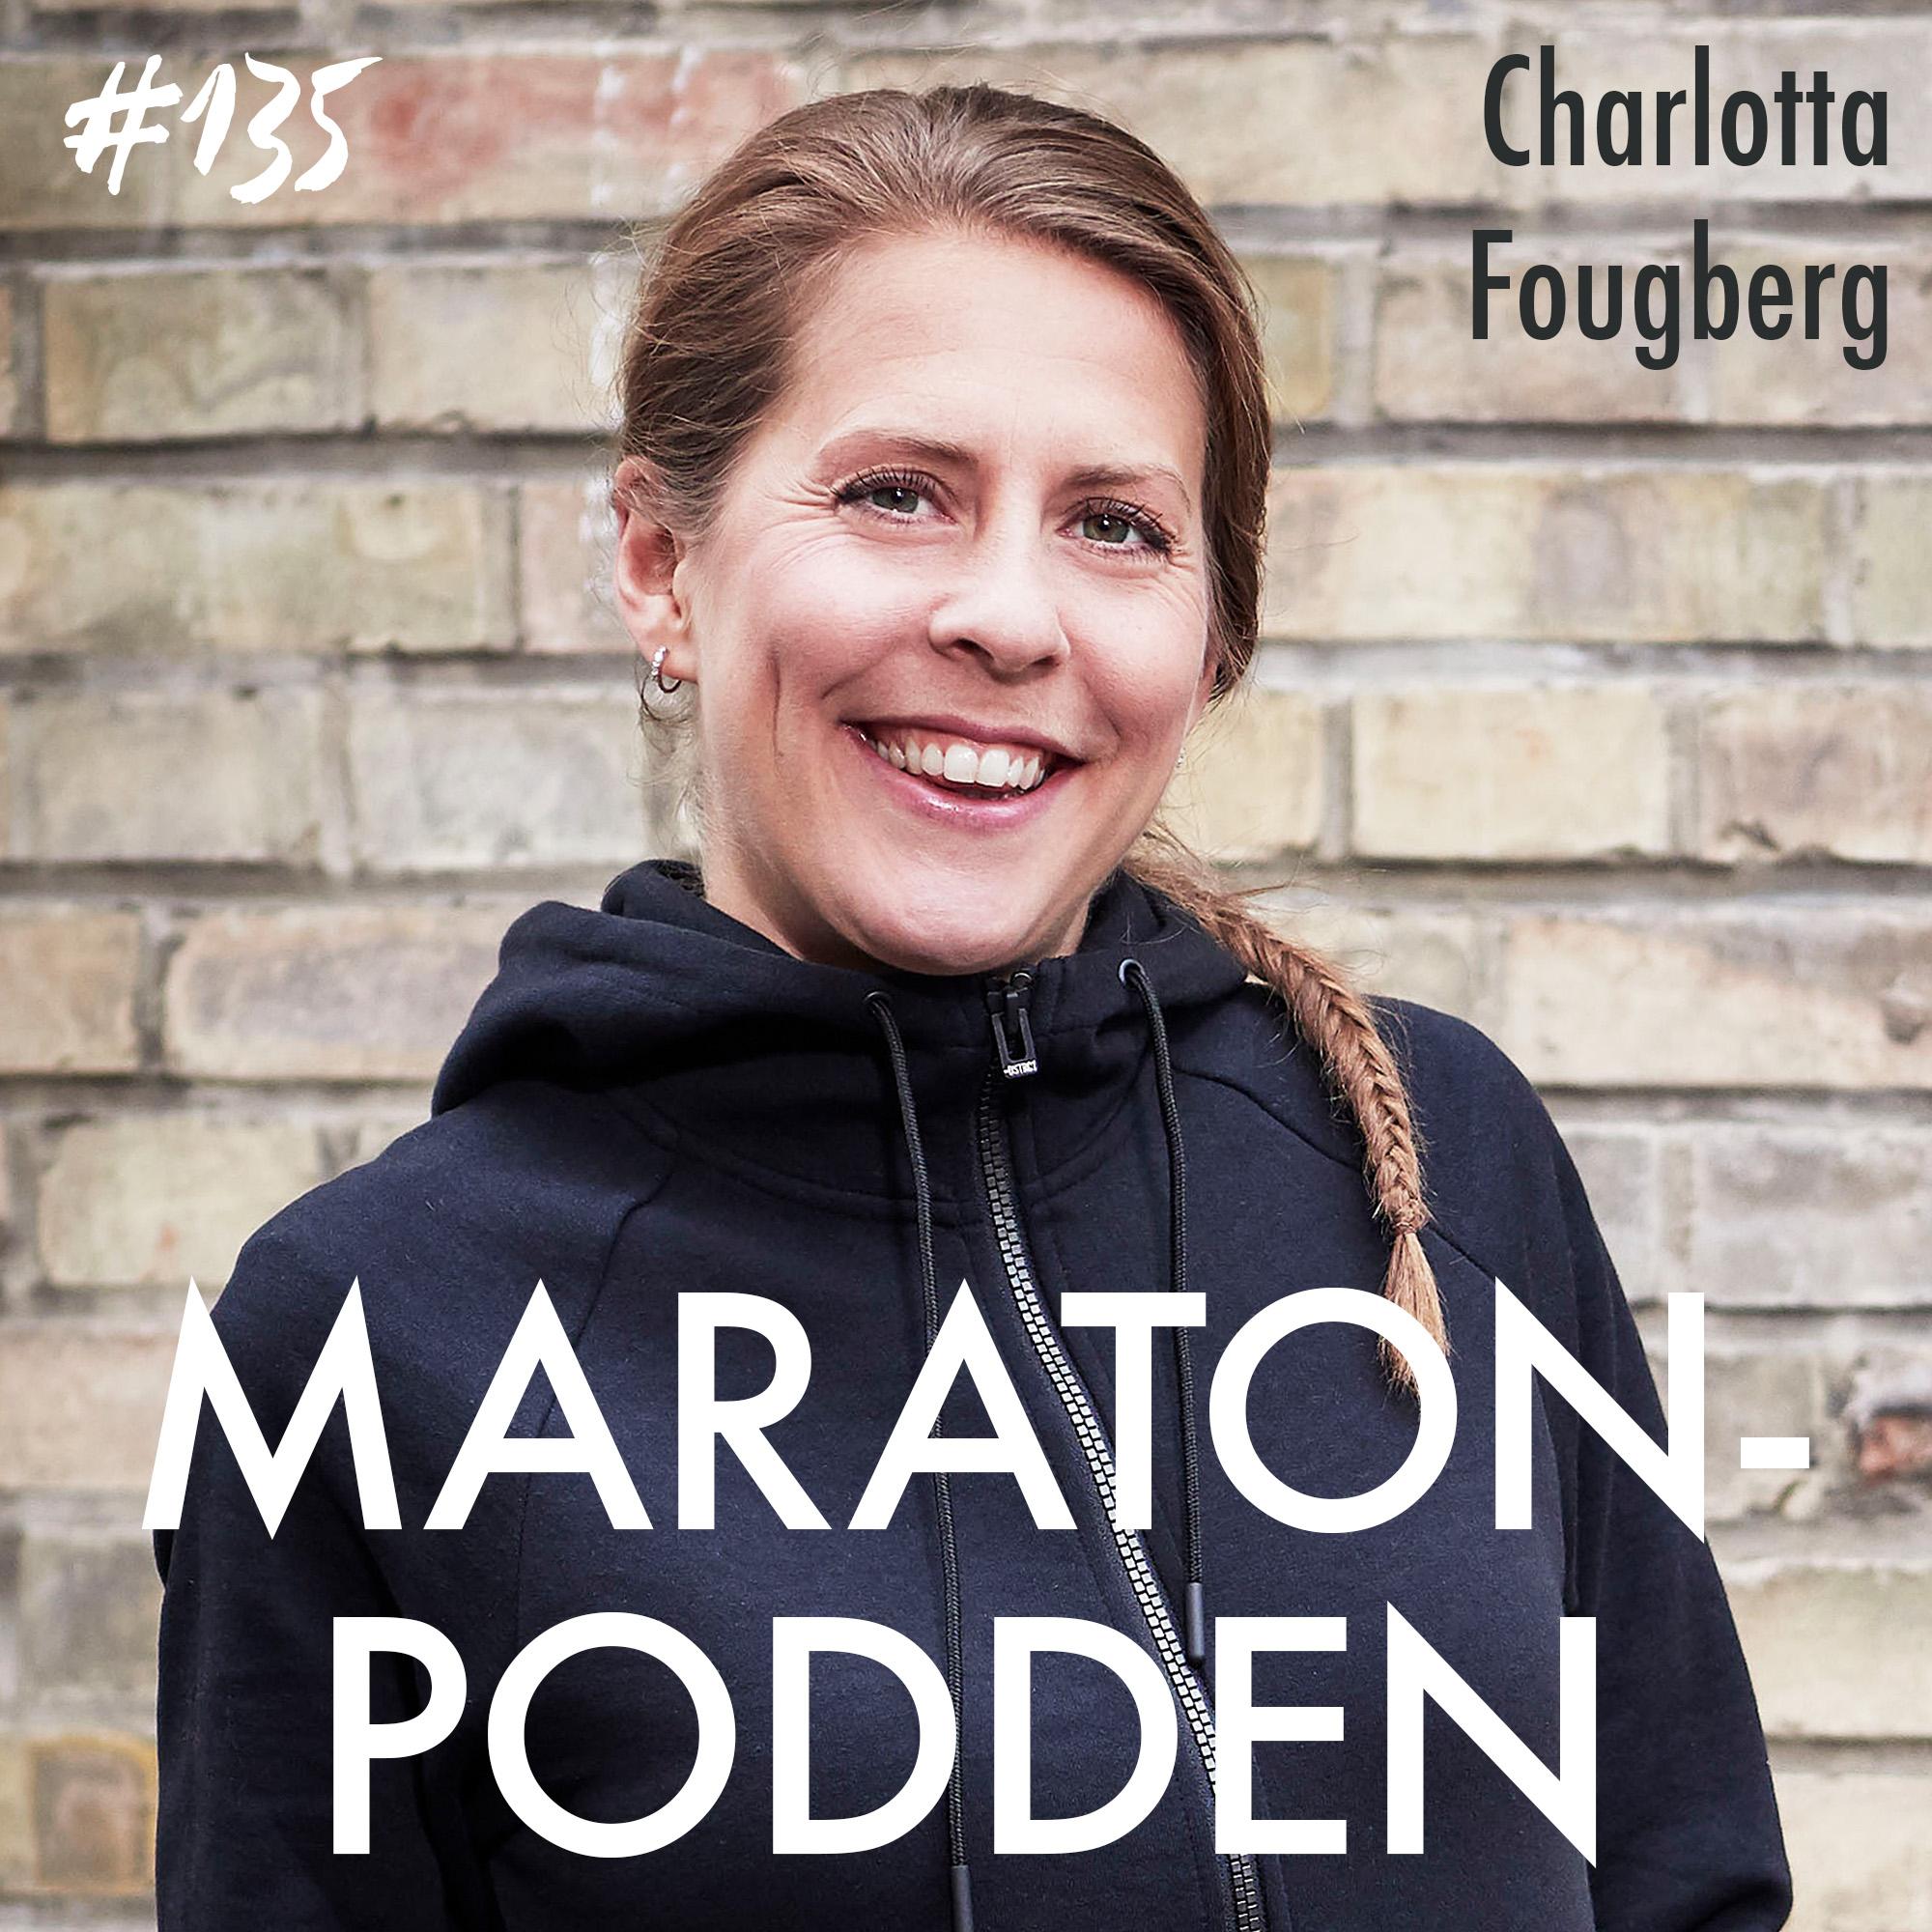 Charlotta Fougberg